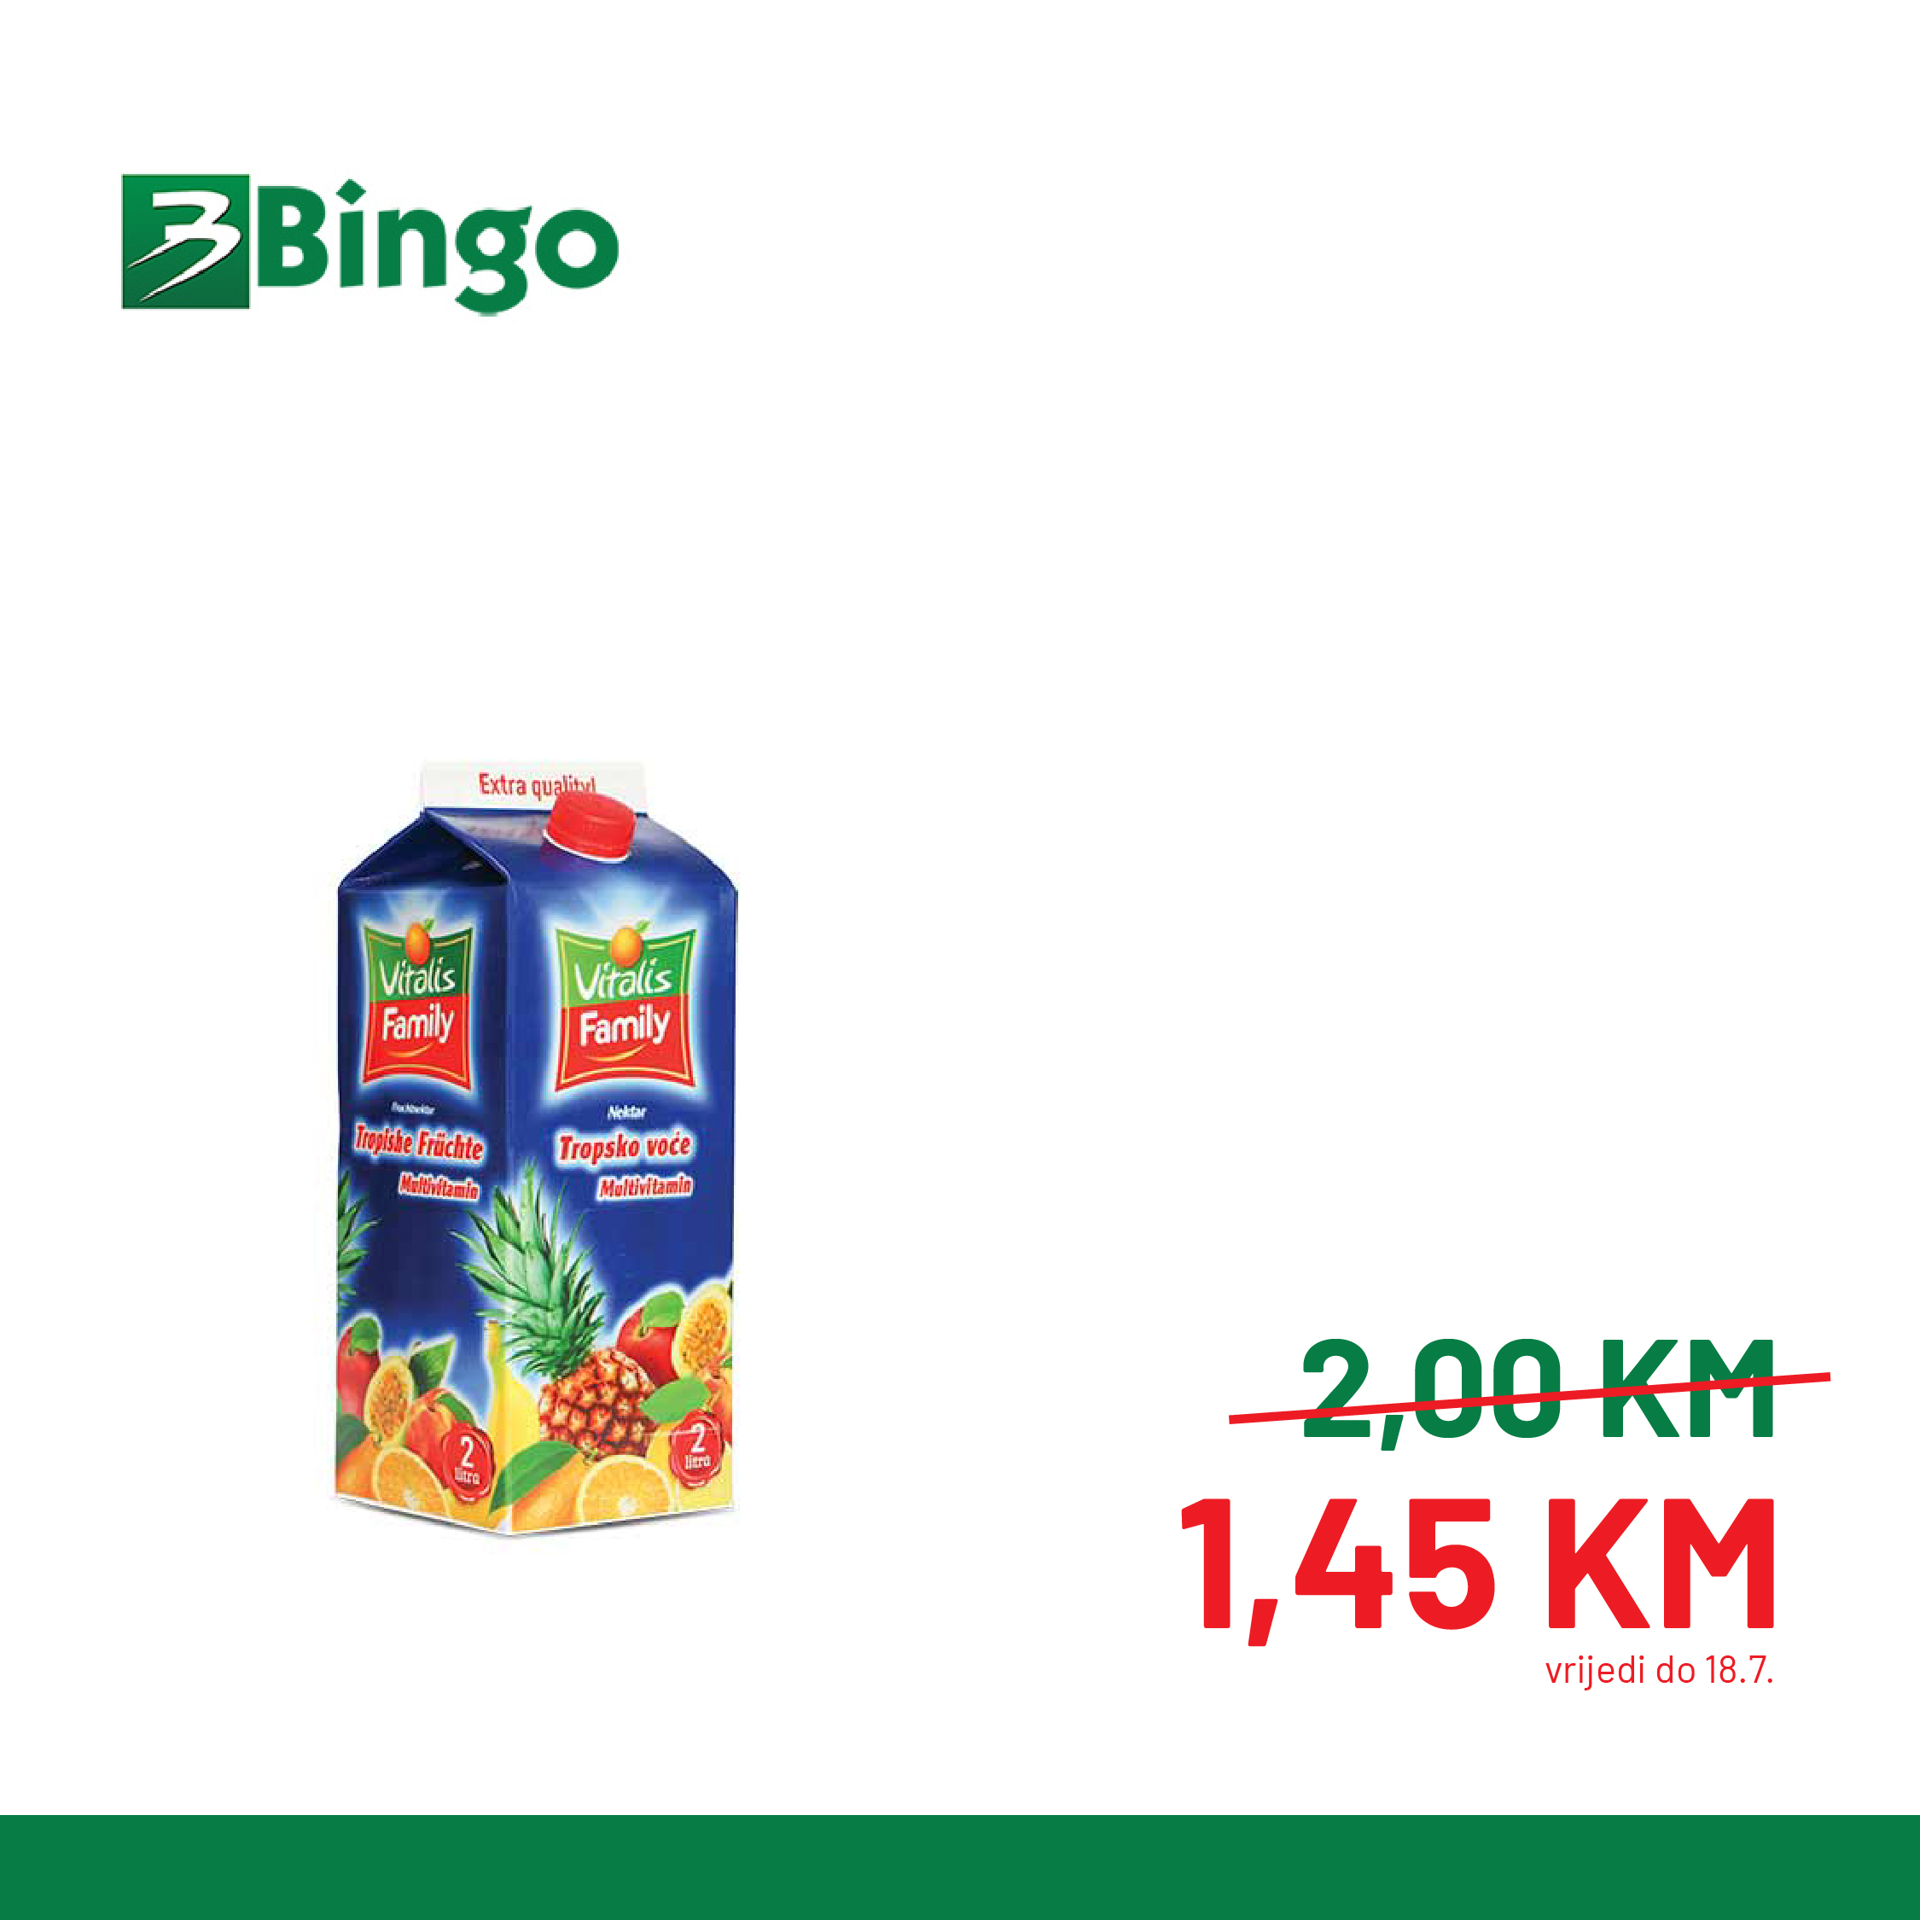 BINGO Katalog Super BINGO Ponude JUL 2021 10.7.2021. 18.7 4